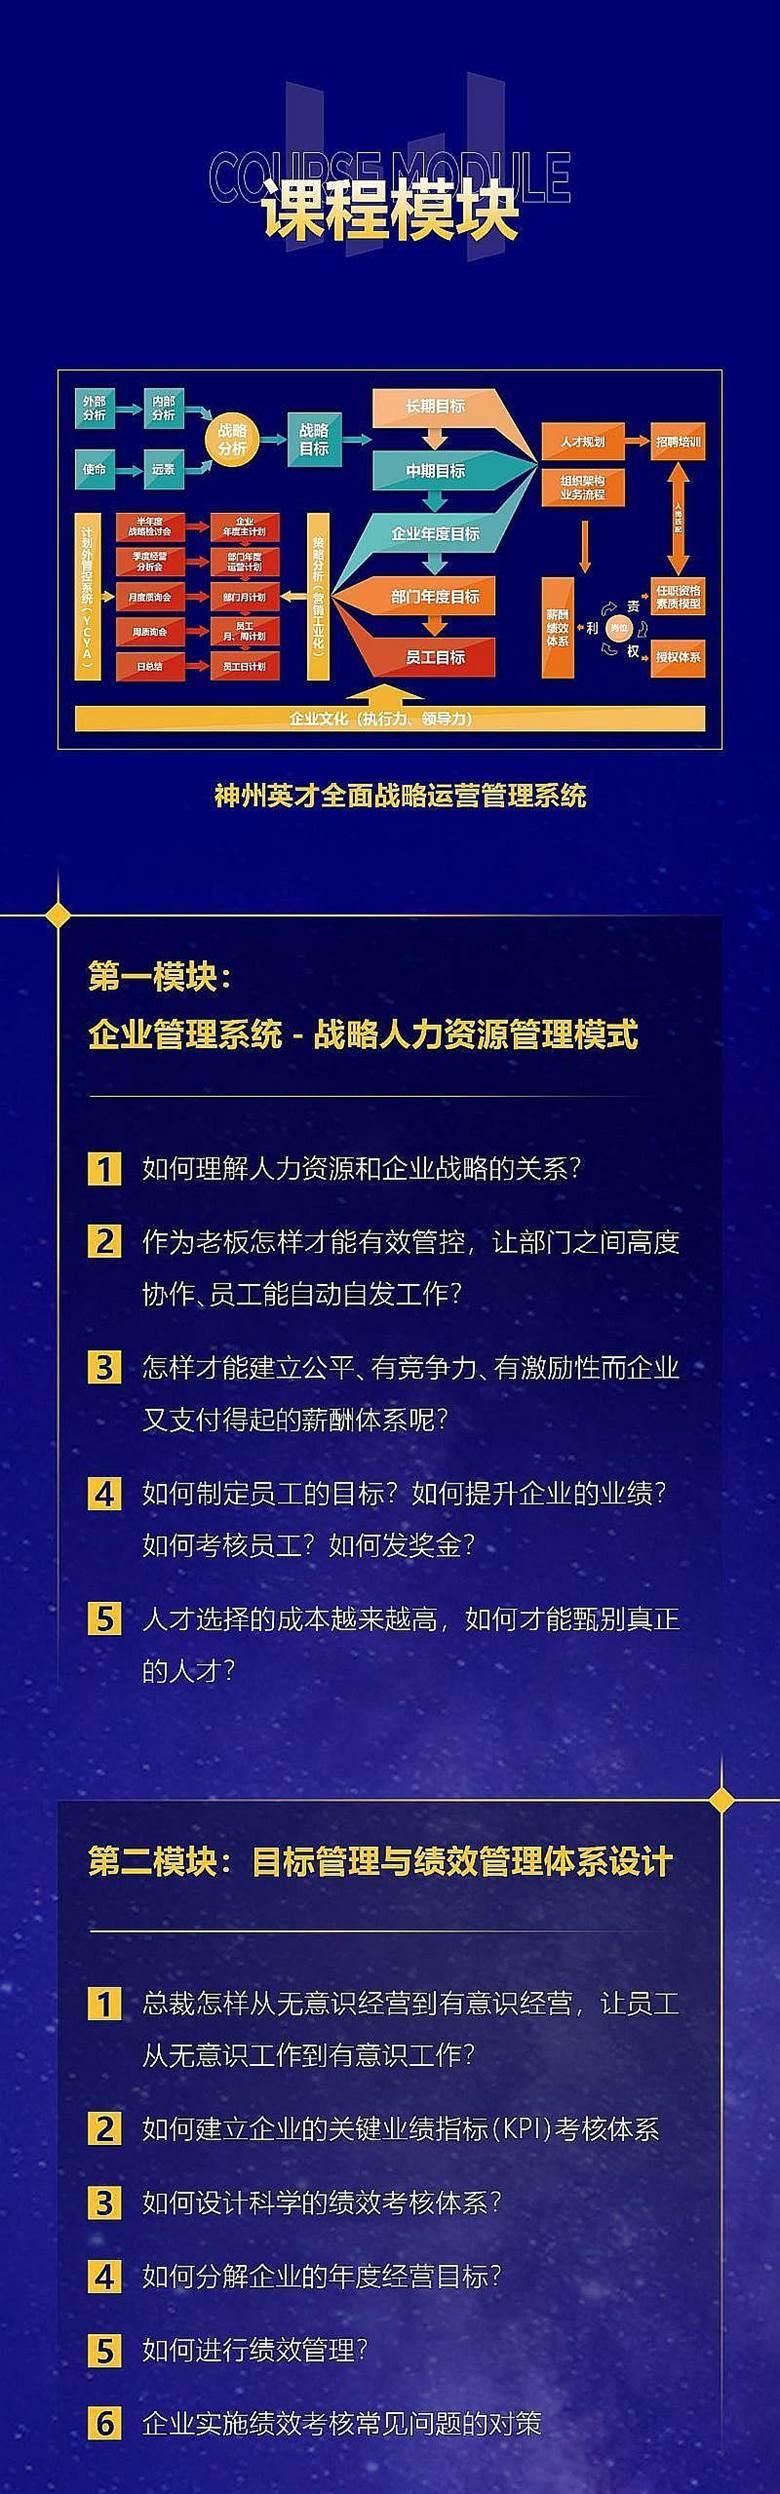 http://www.huodongxing.com/file/20191106/3803596076678/223981000876100.jpeg